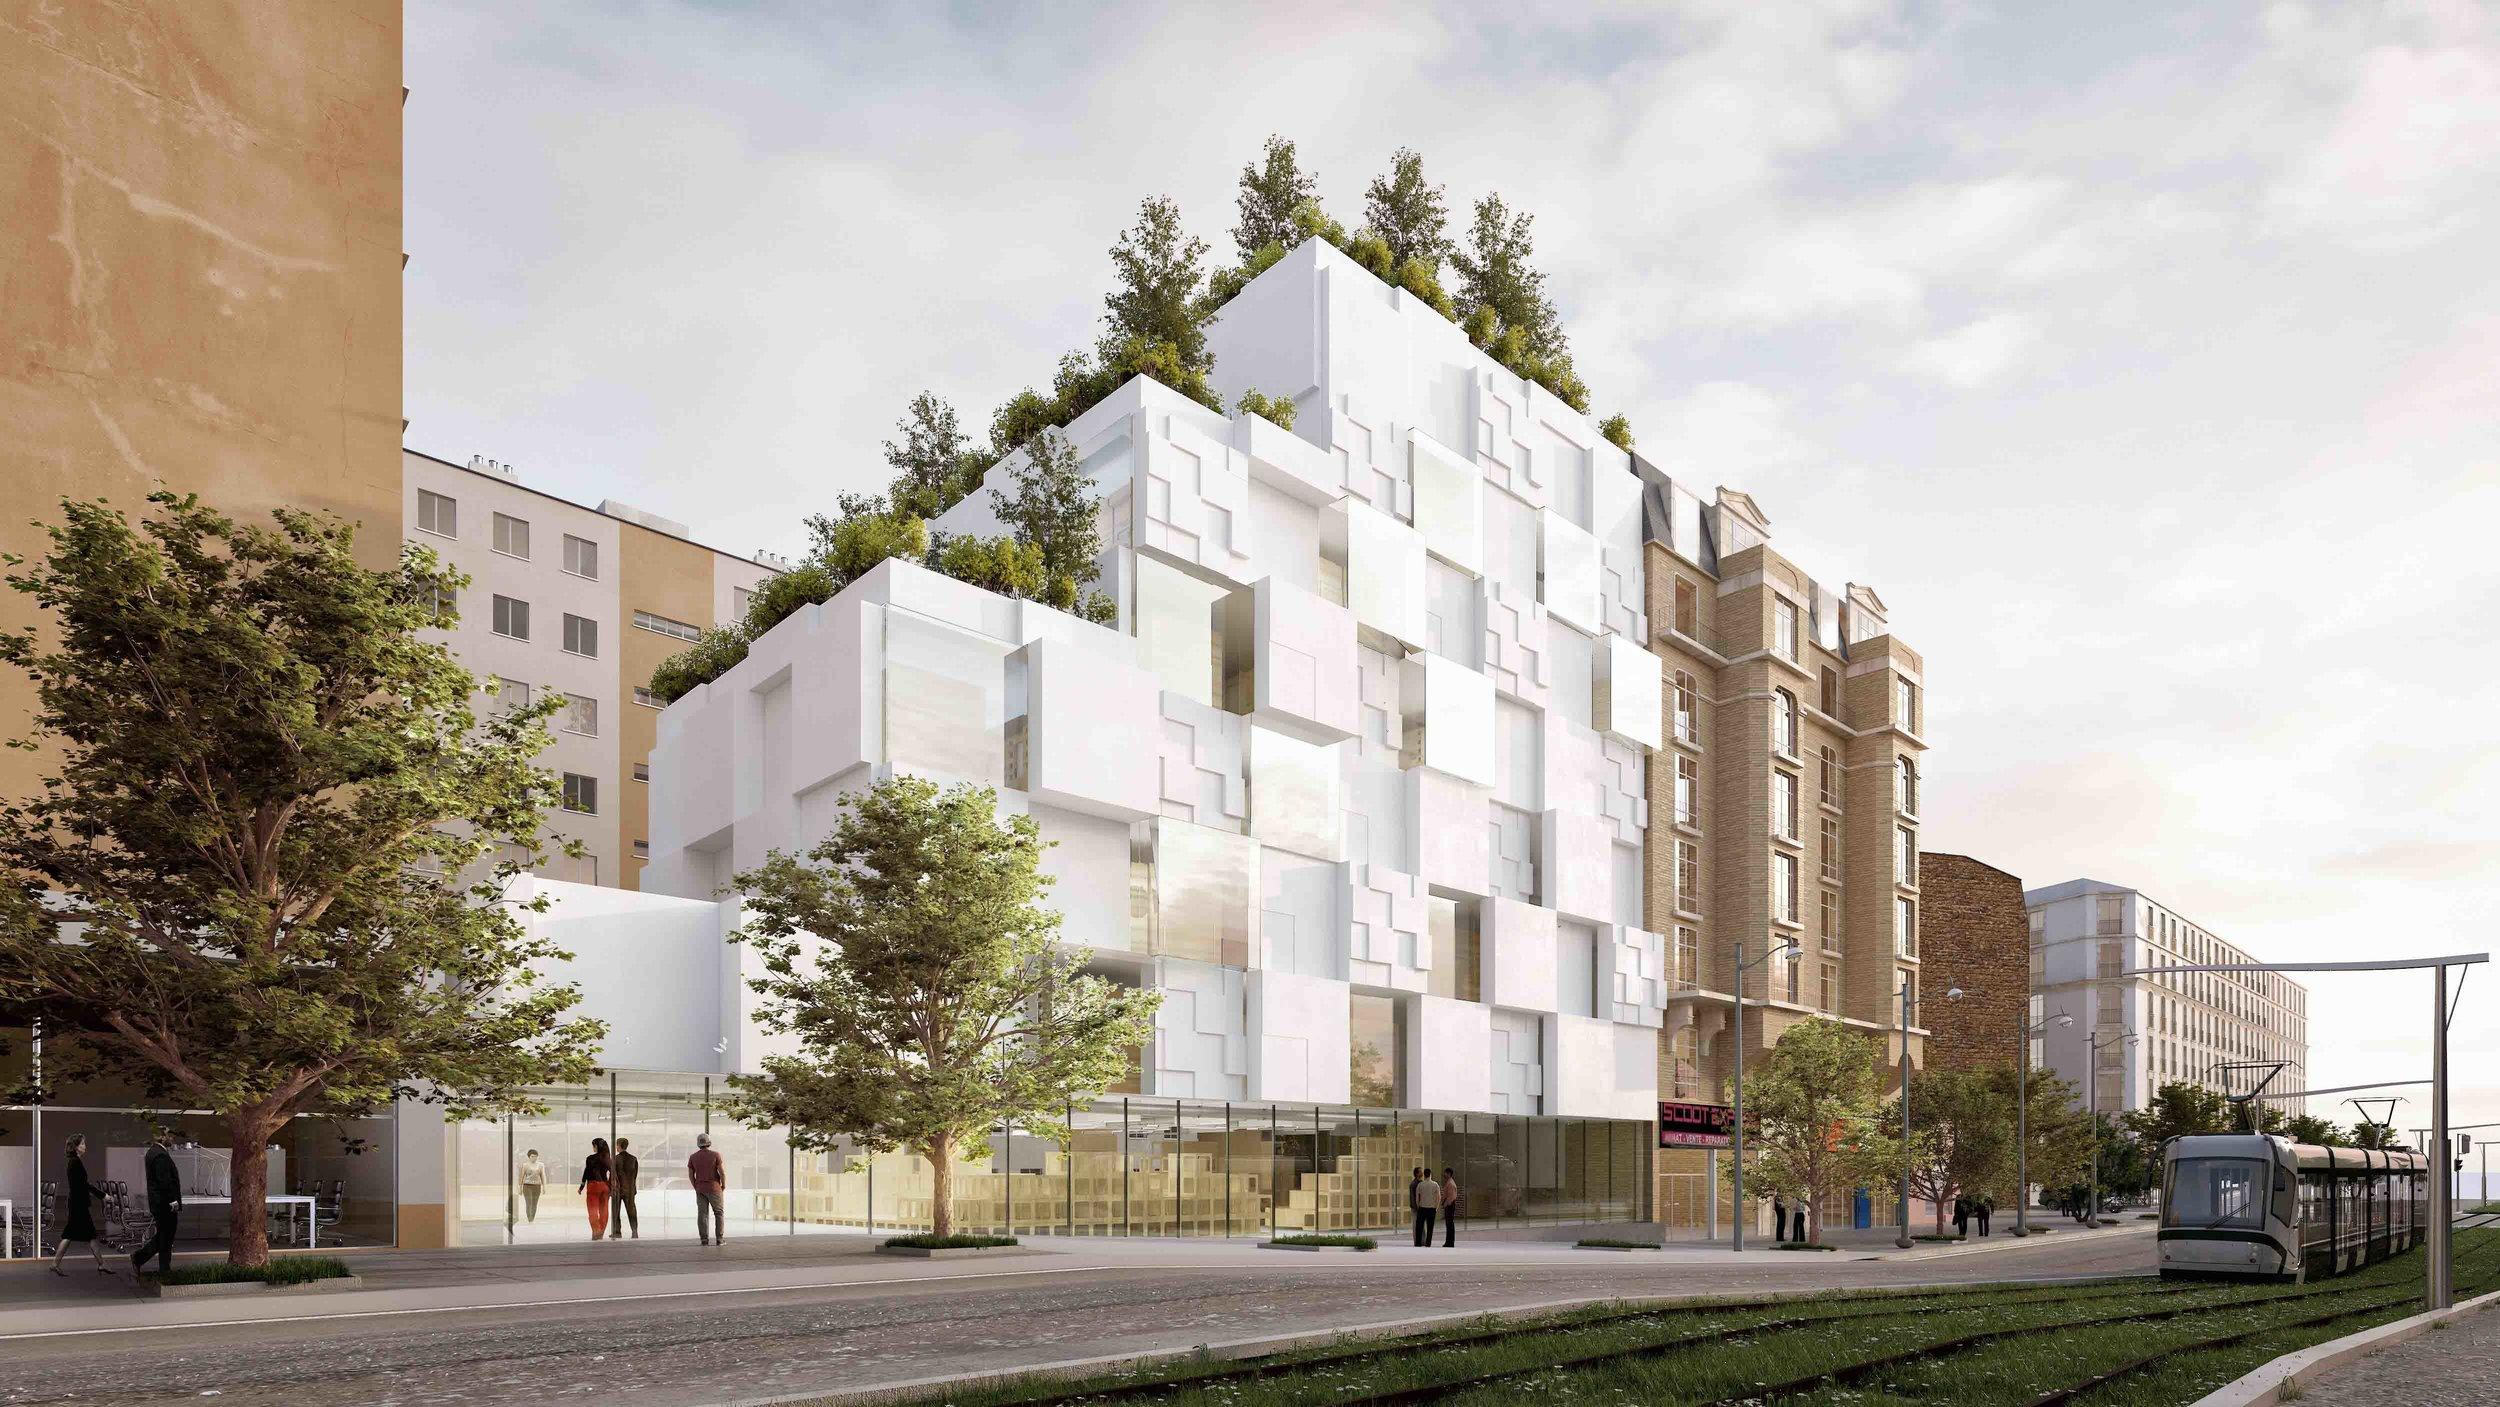 reinventer - paris- noc 42 - xavier - niel - ar - Studio - architectures - ecole 42   Kwame YAMGNANE nicolas sadirac - free (3).jpg